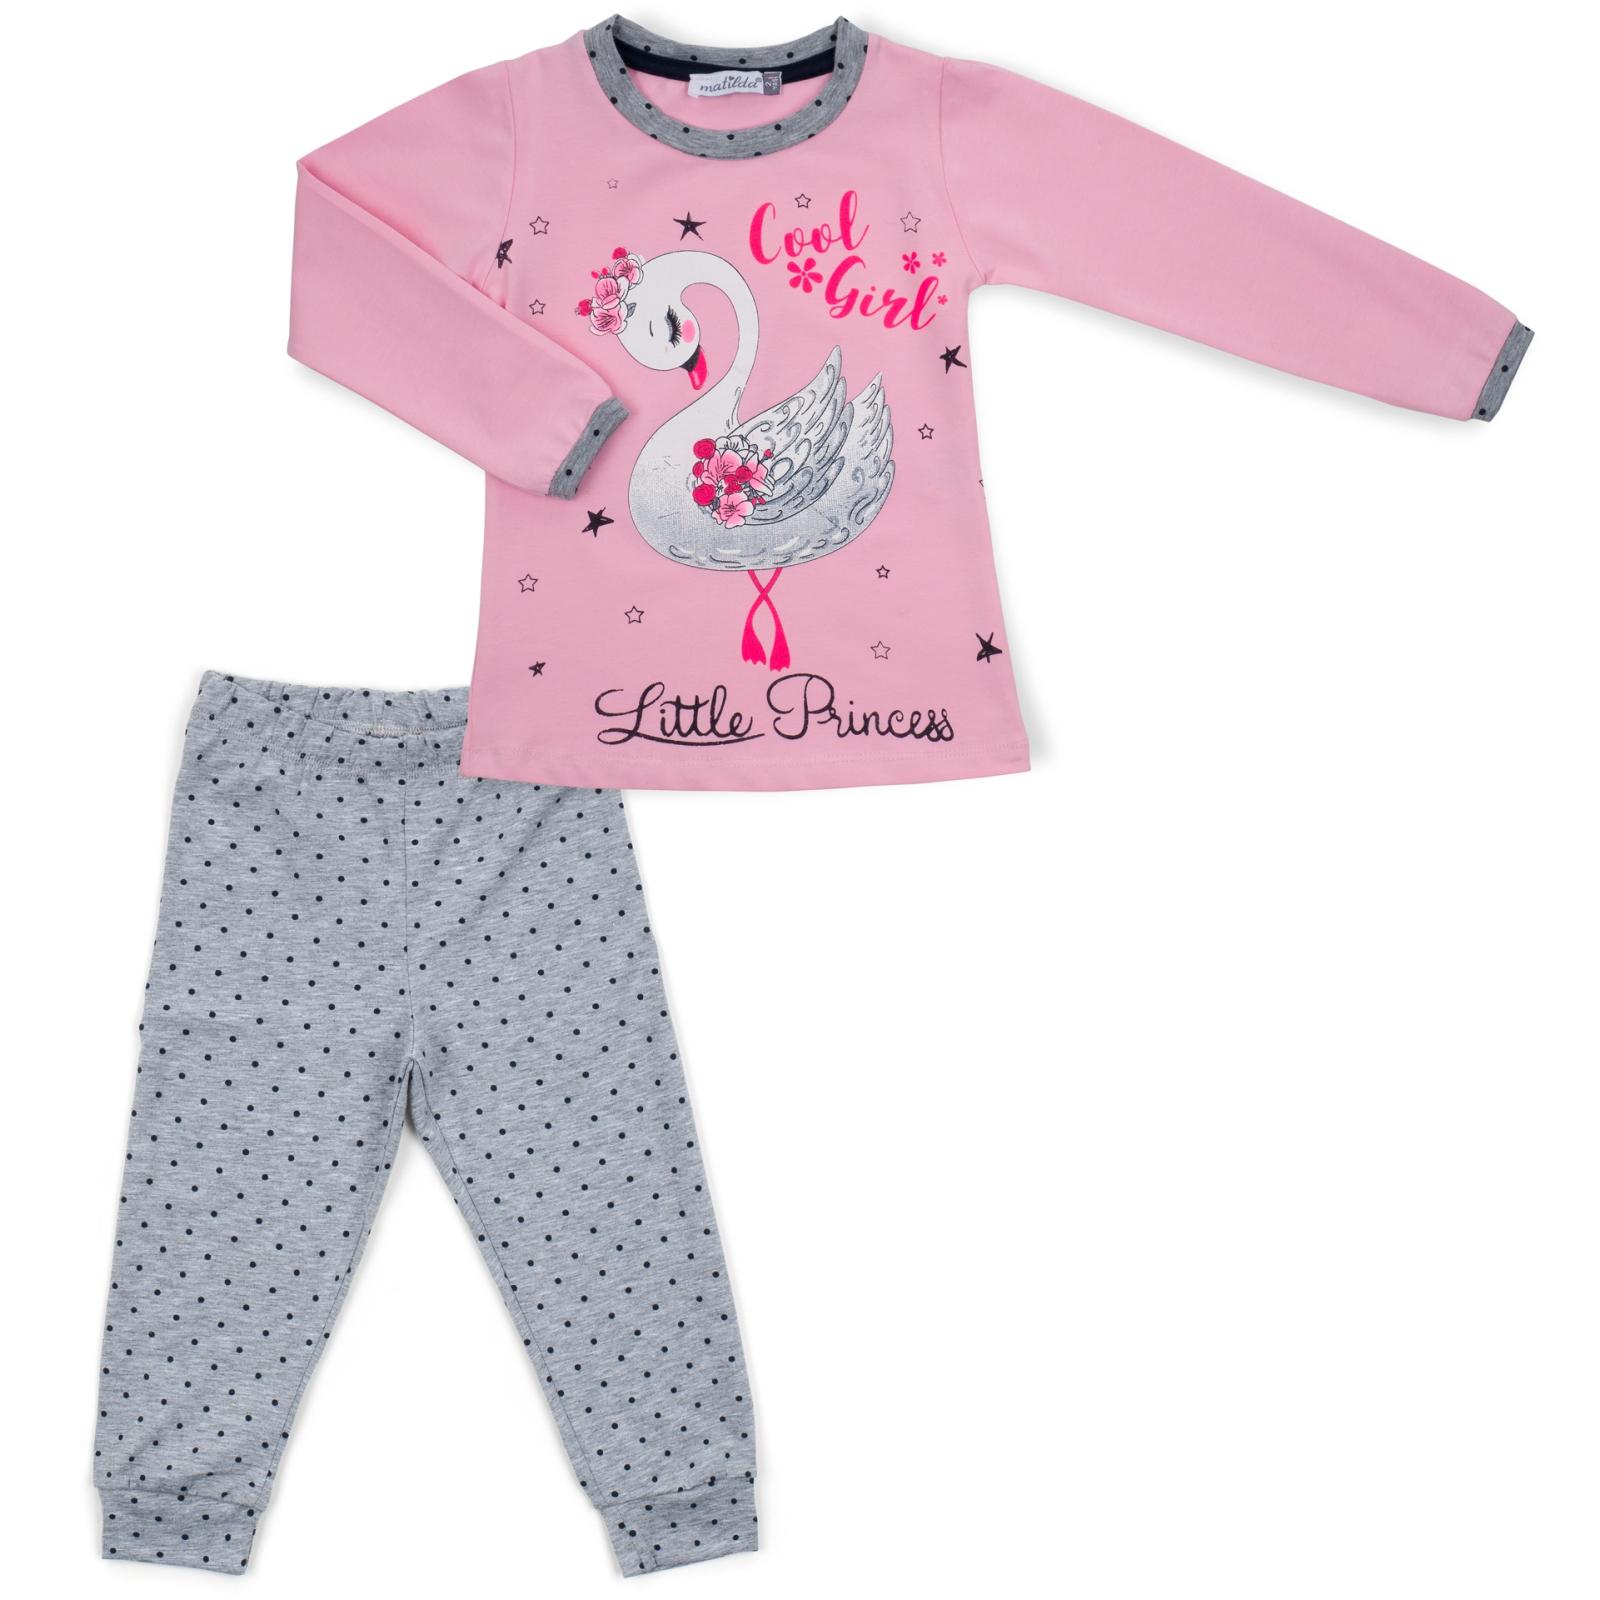 Пижама Matilda с лебедем (10939-2-92G-pink)